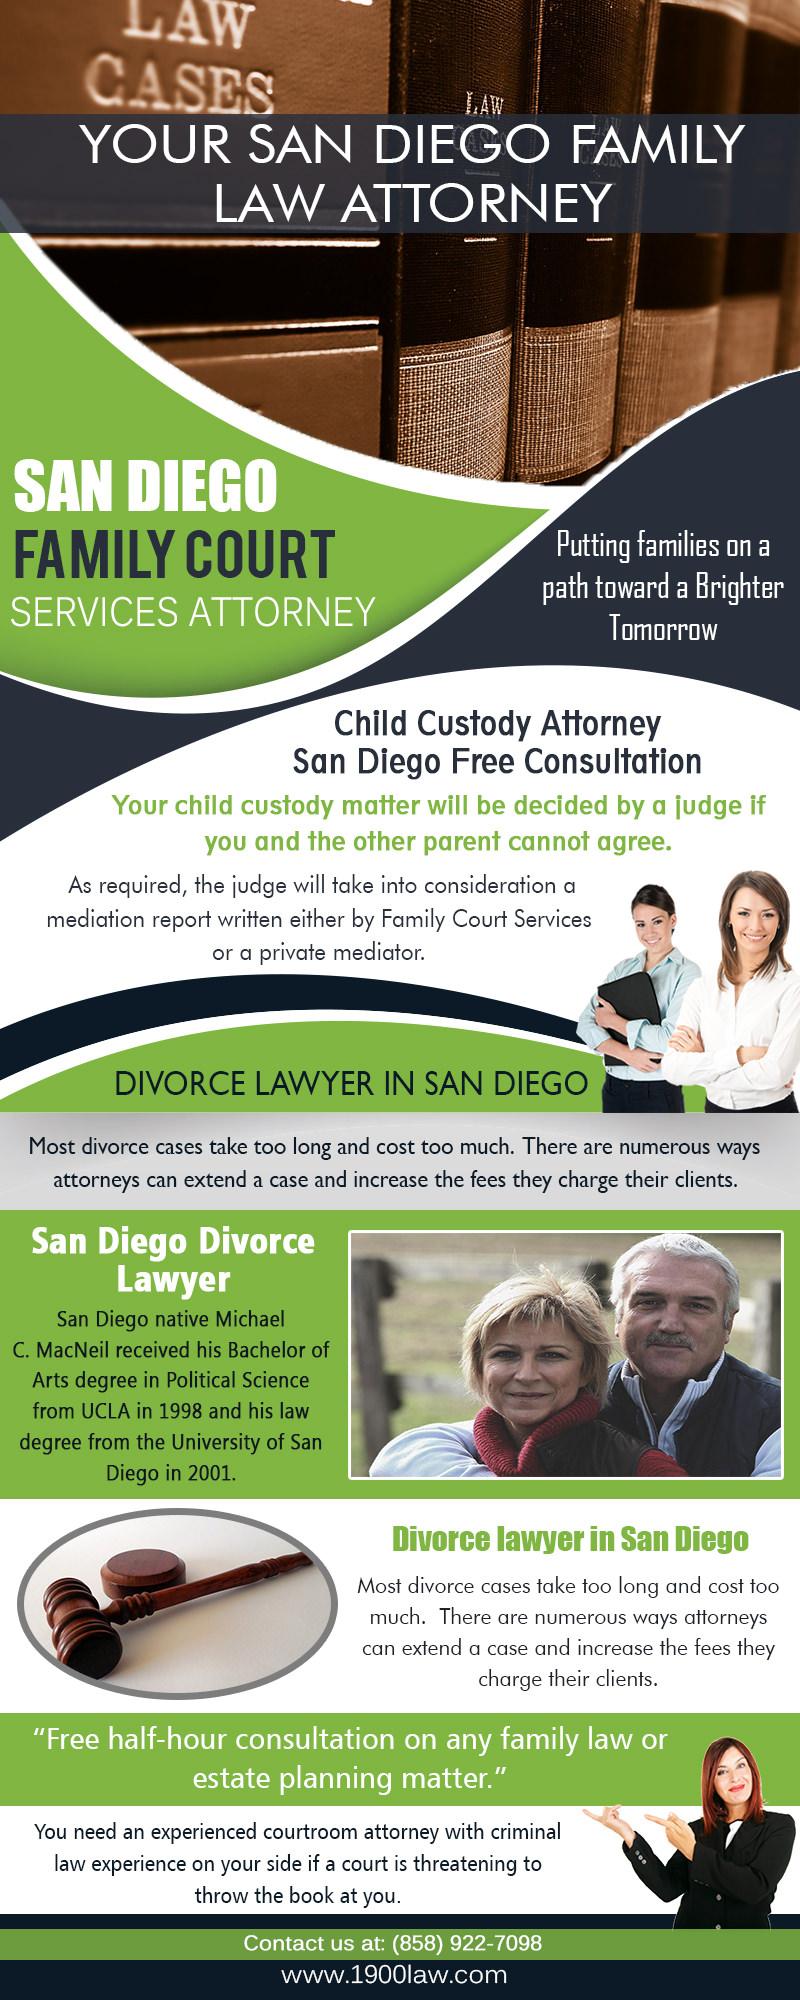 San Diego Family Court Service Attorney -858-922-7098